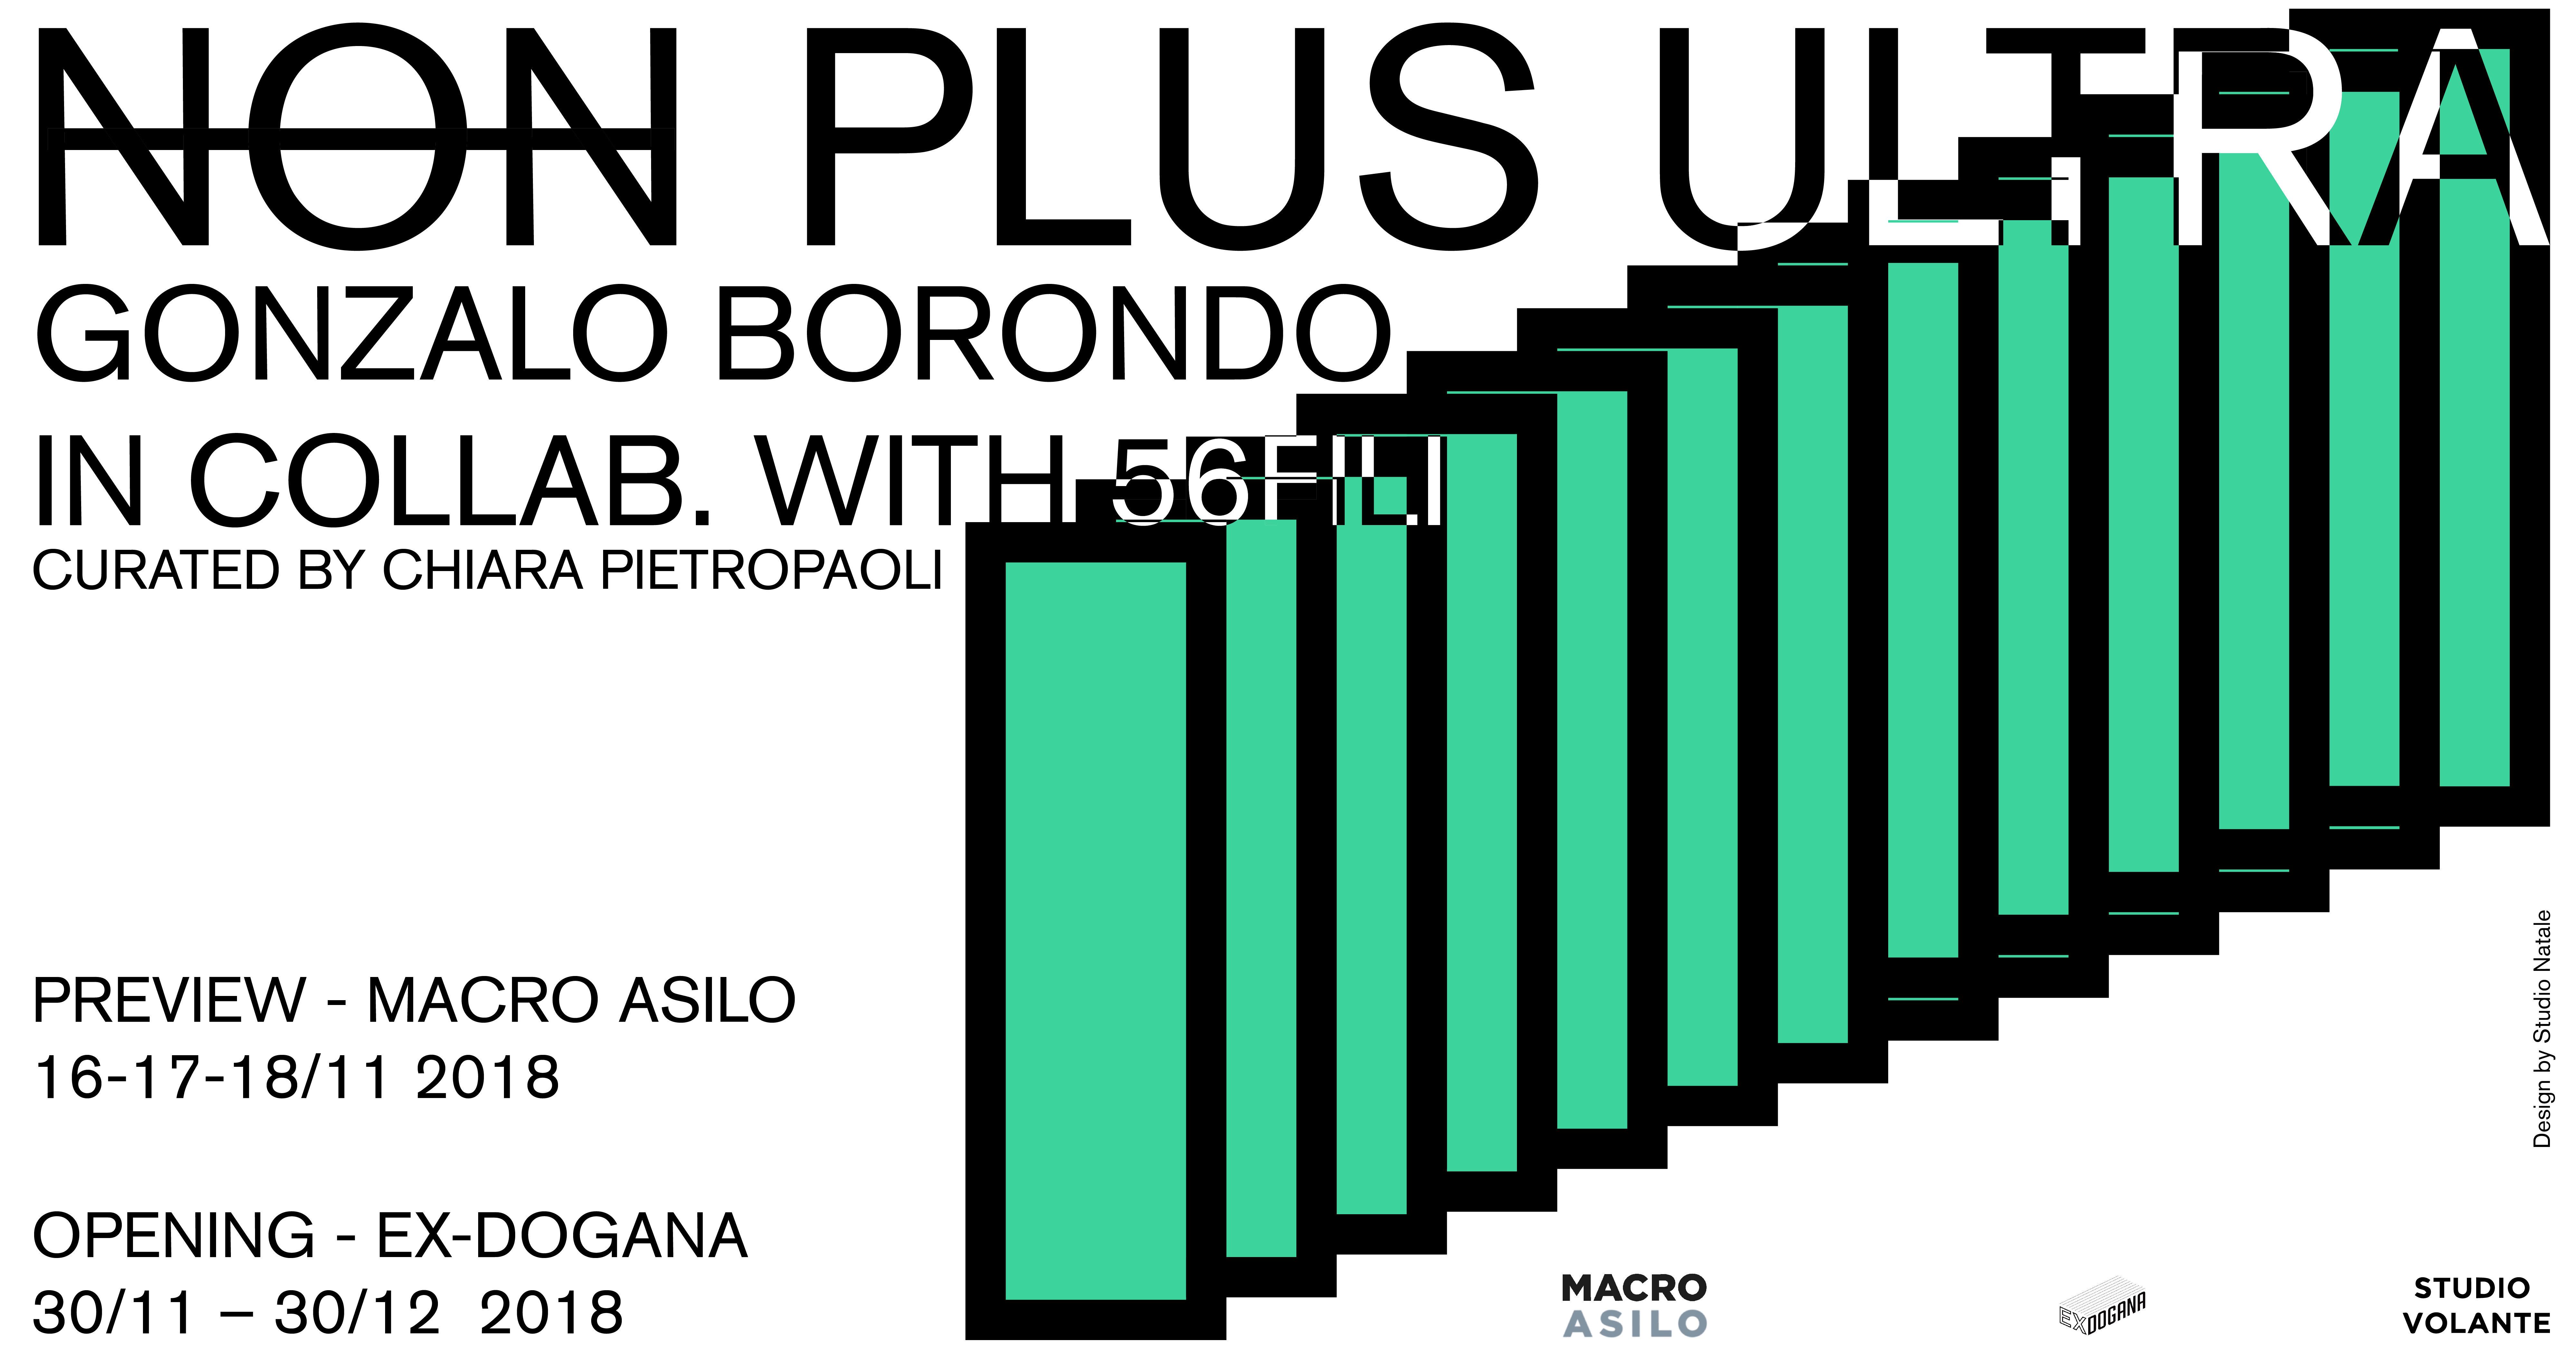 Non Plus Ultra | Gonzalo Borondo | Macro Asilo – exDogana